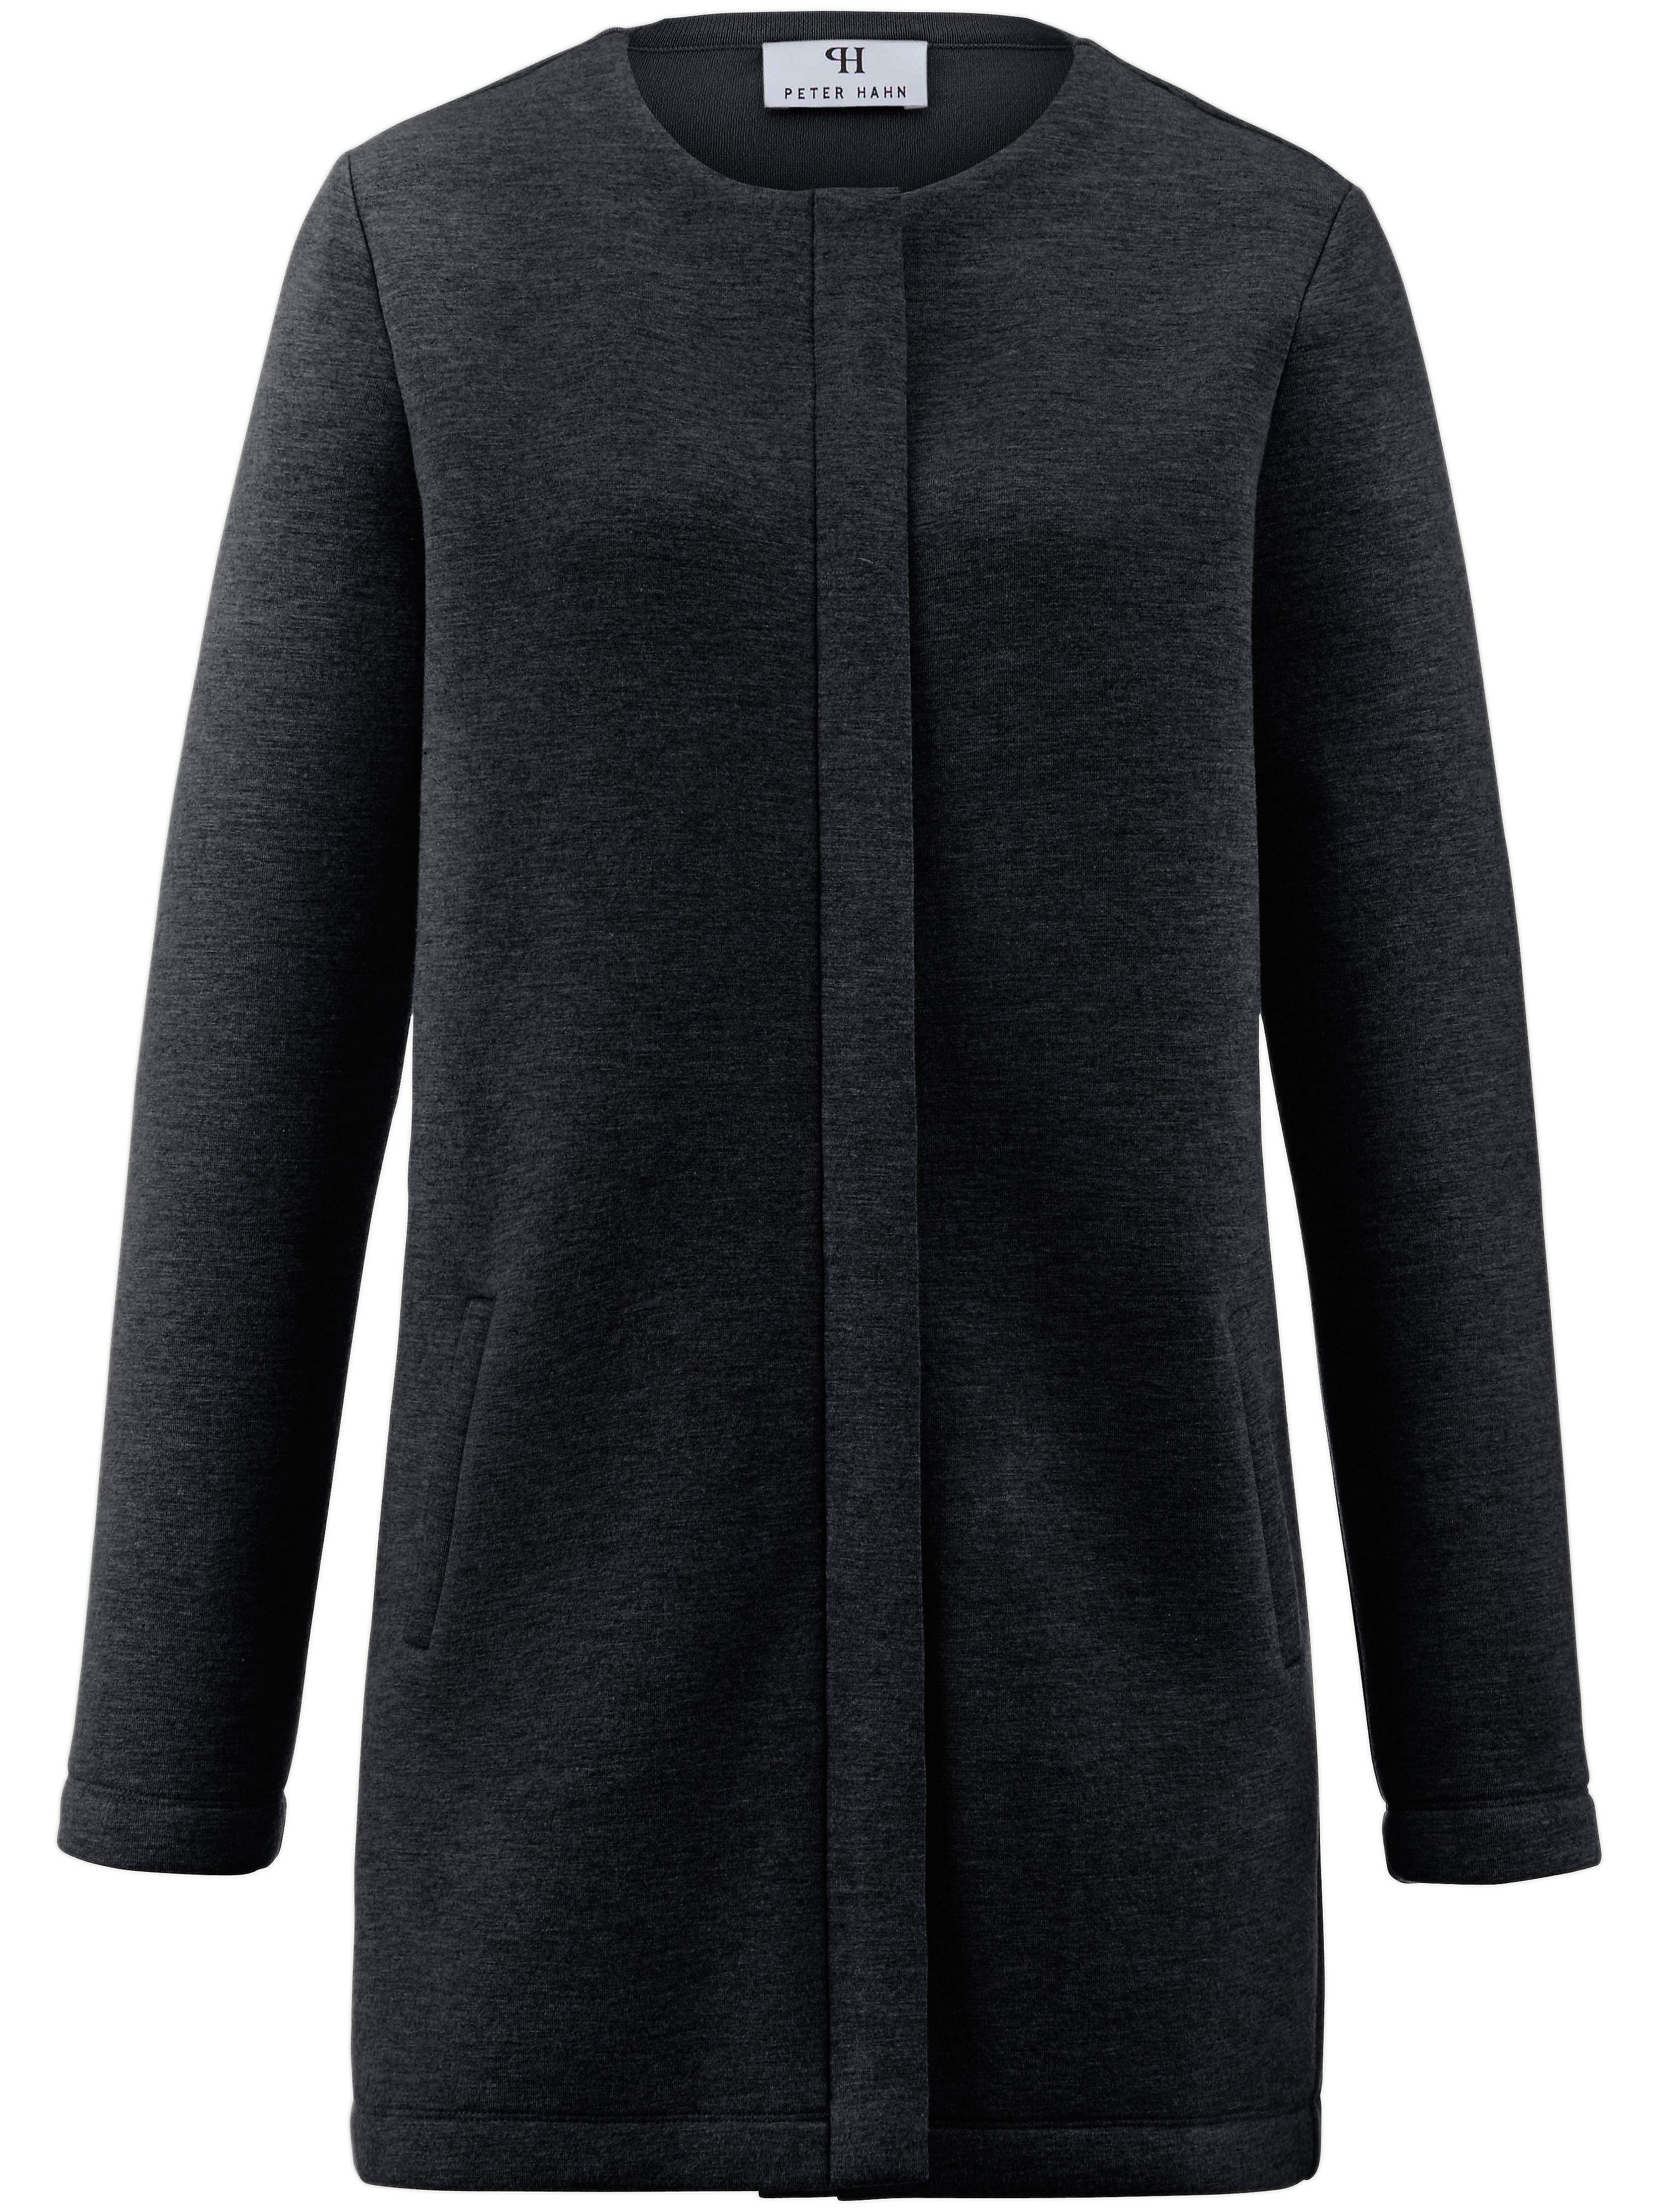 Jersey-Mantel 1/1-Arm Peter Hahn schwarz | Bekleidung > Mäntel > Sonstige Mäntel | Jersey | Peter Hahn